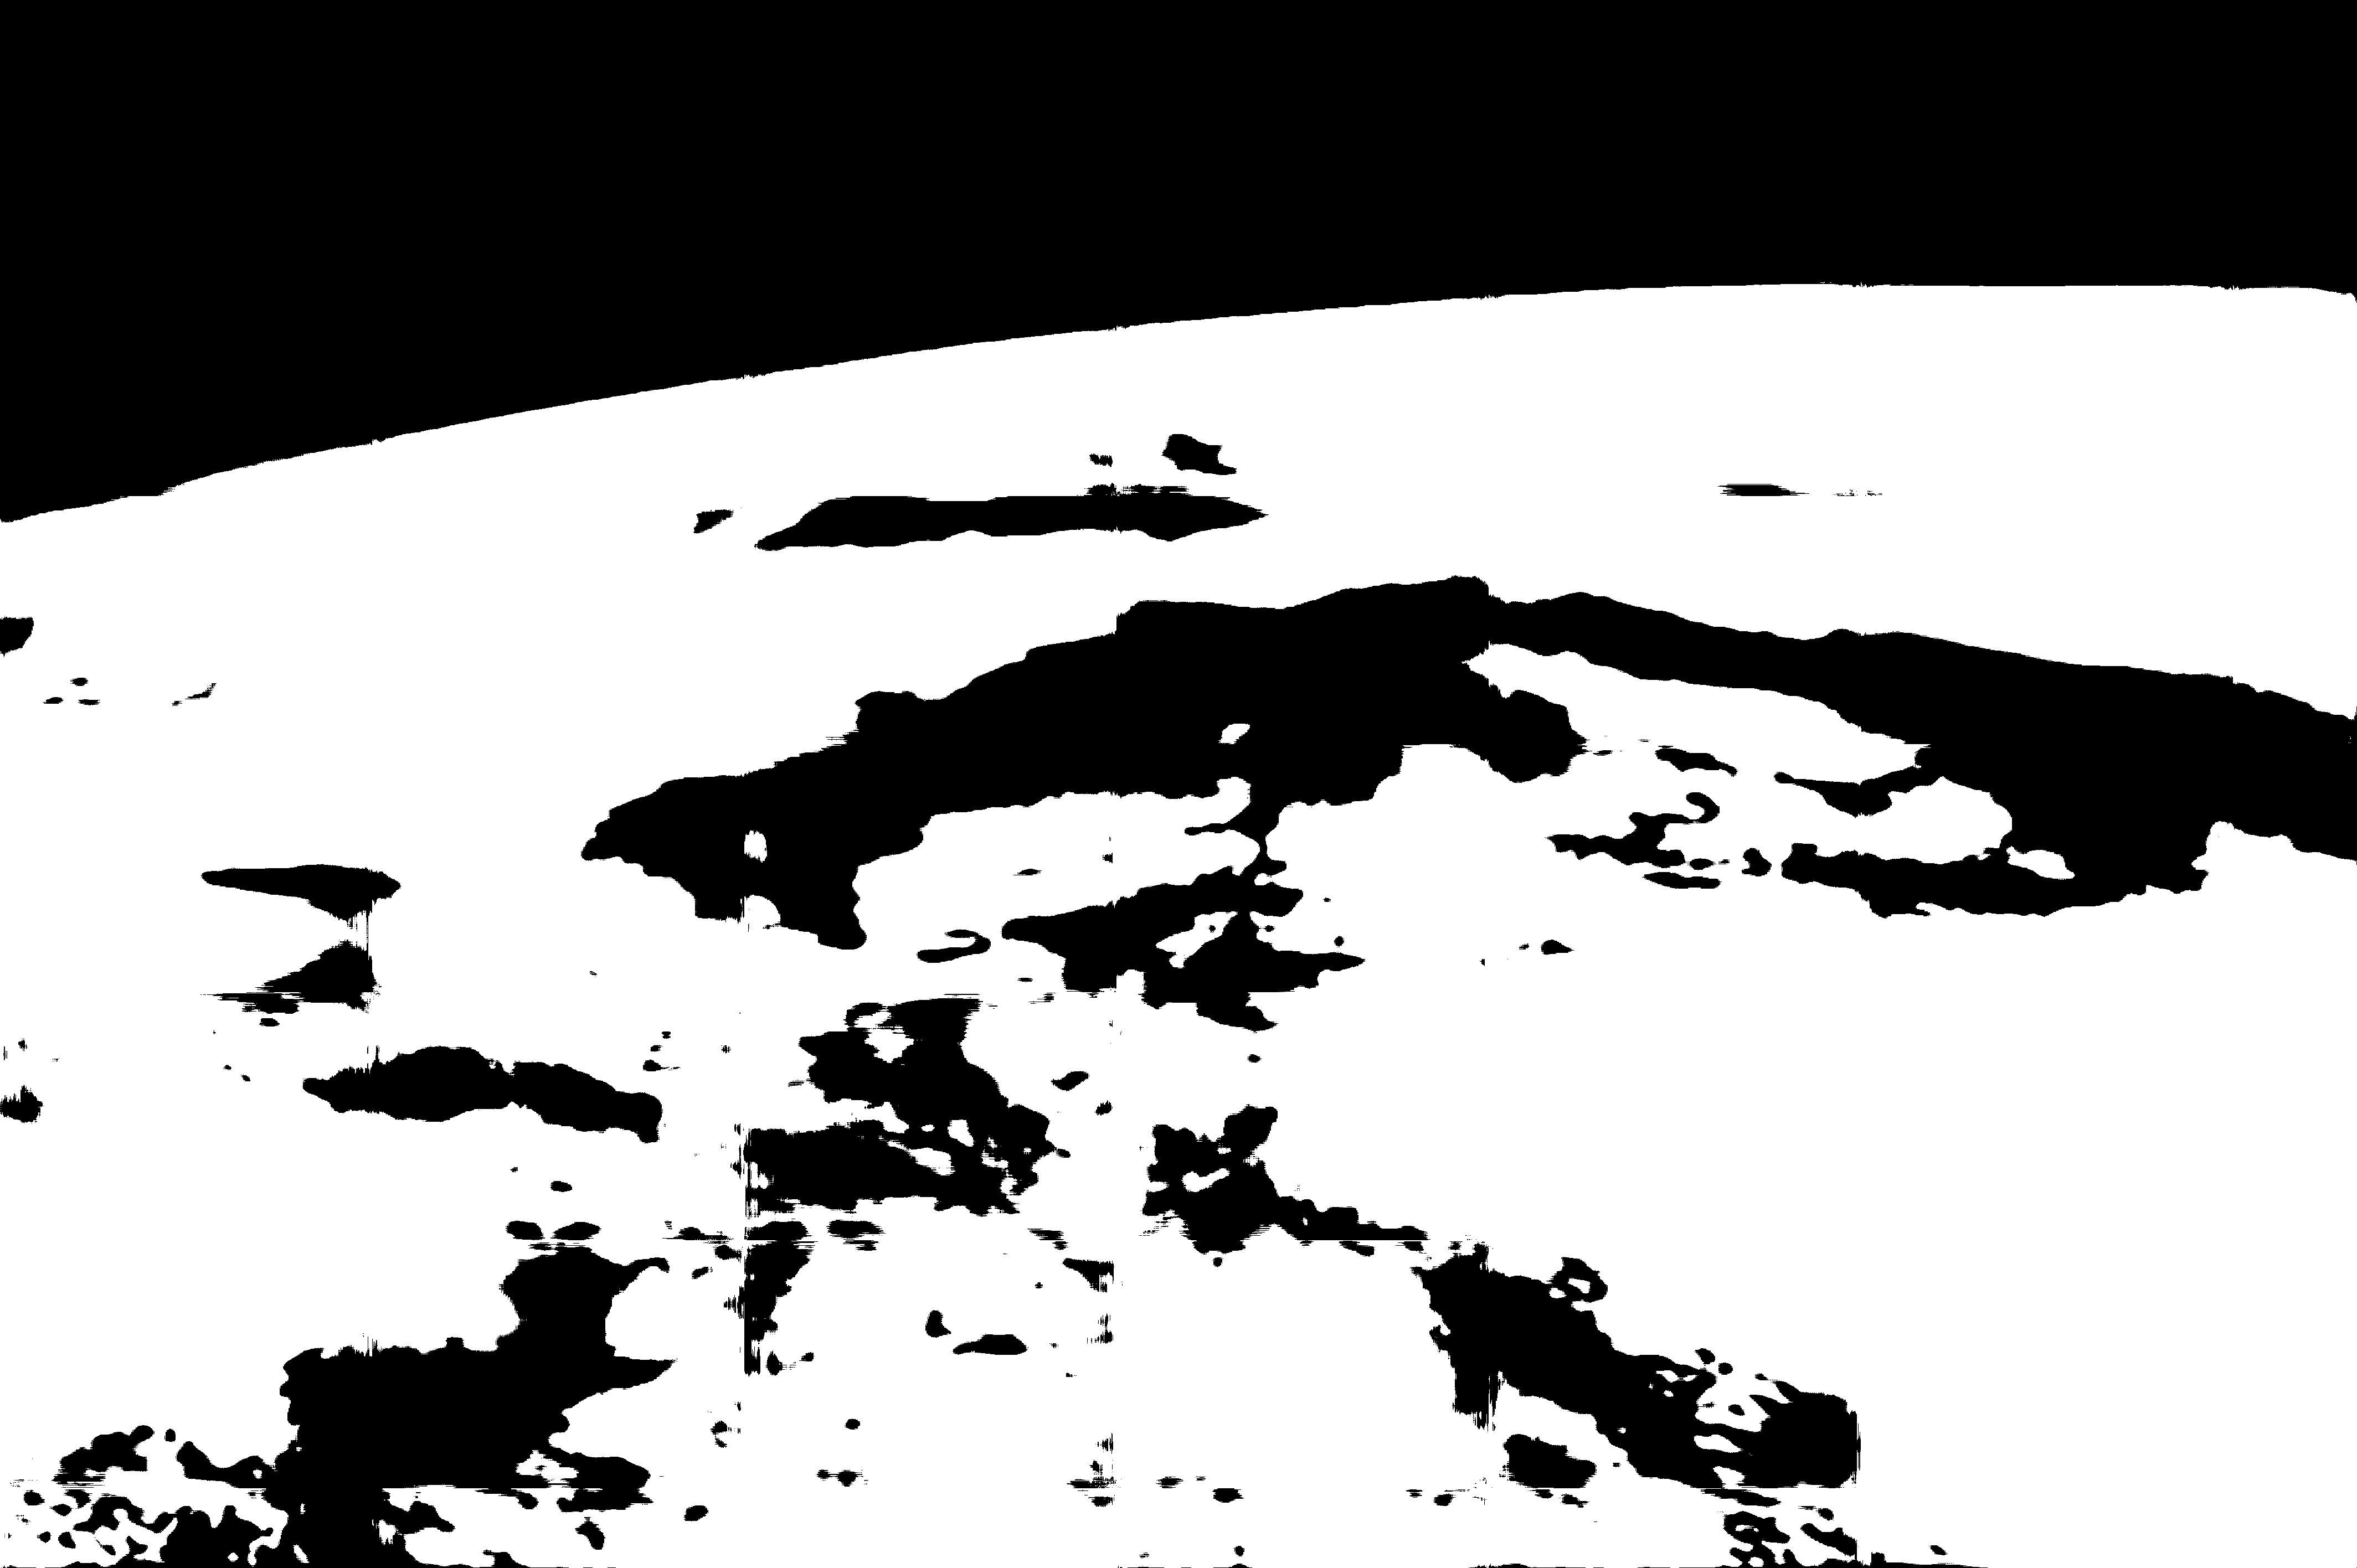 Astronaut Photo ISS041-E-11788 USA-MARYLAND